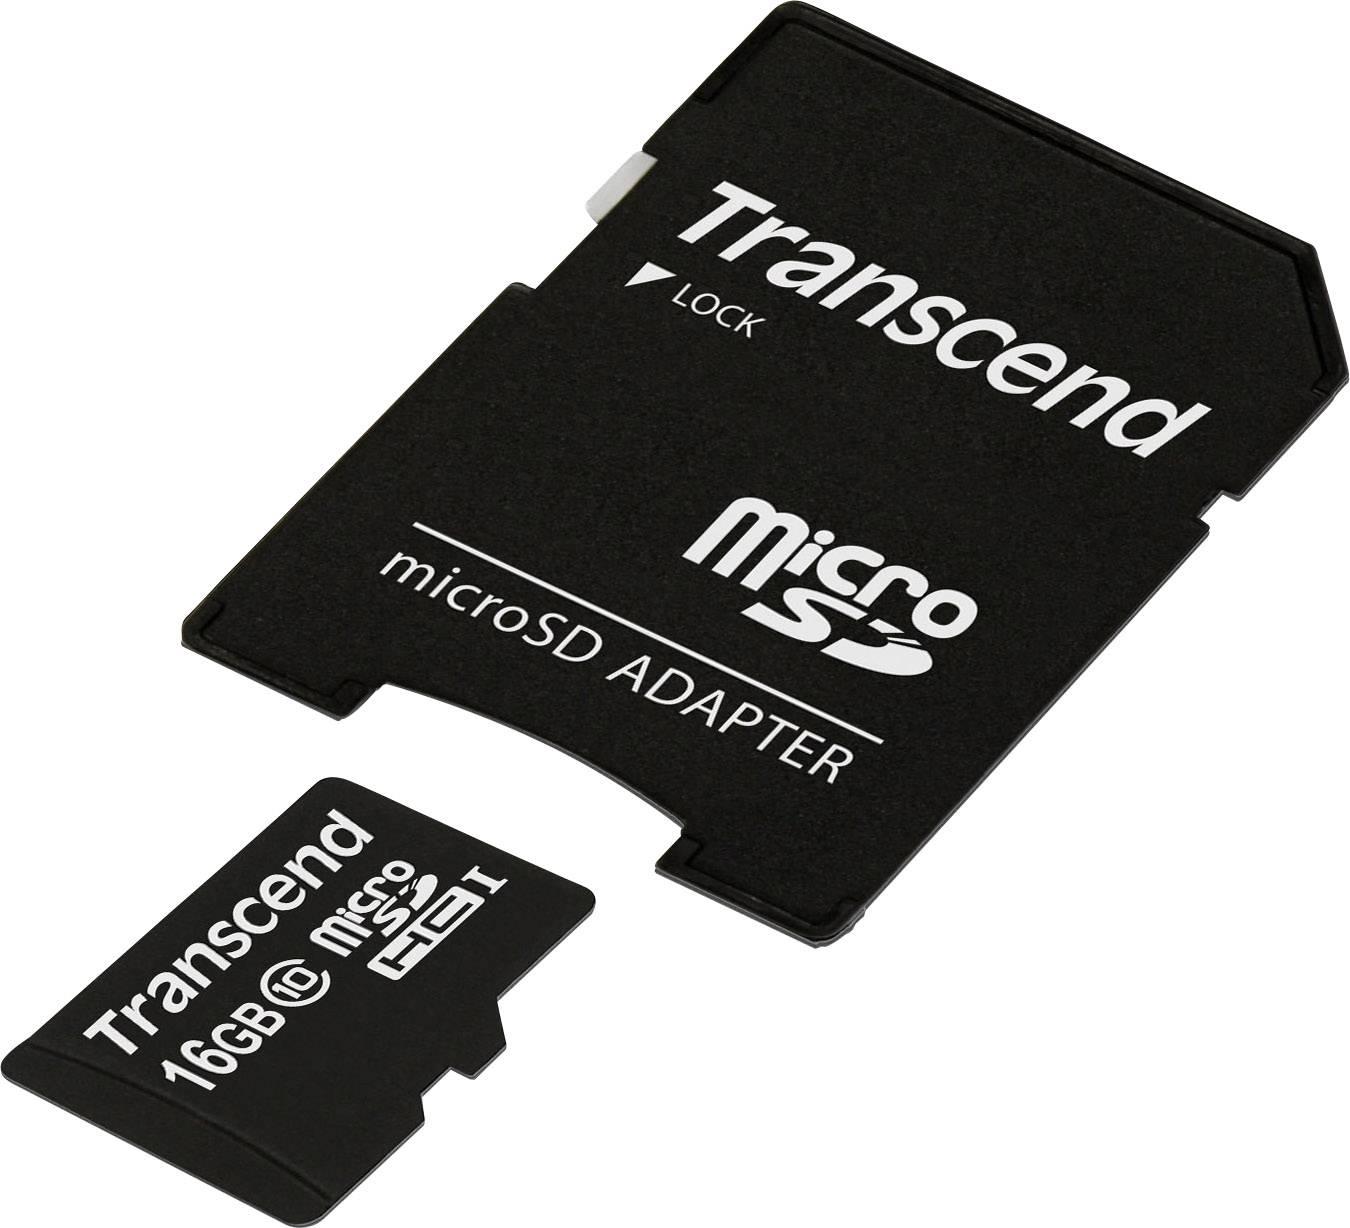 Pamäťová karta Micro SDHC 16 GB Transcend Premium Class 10, UHS-I vr.SD adaptéru